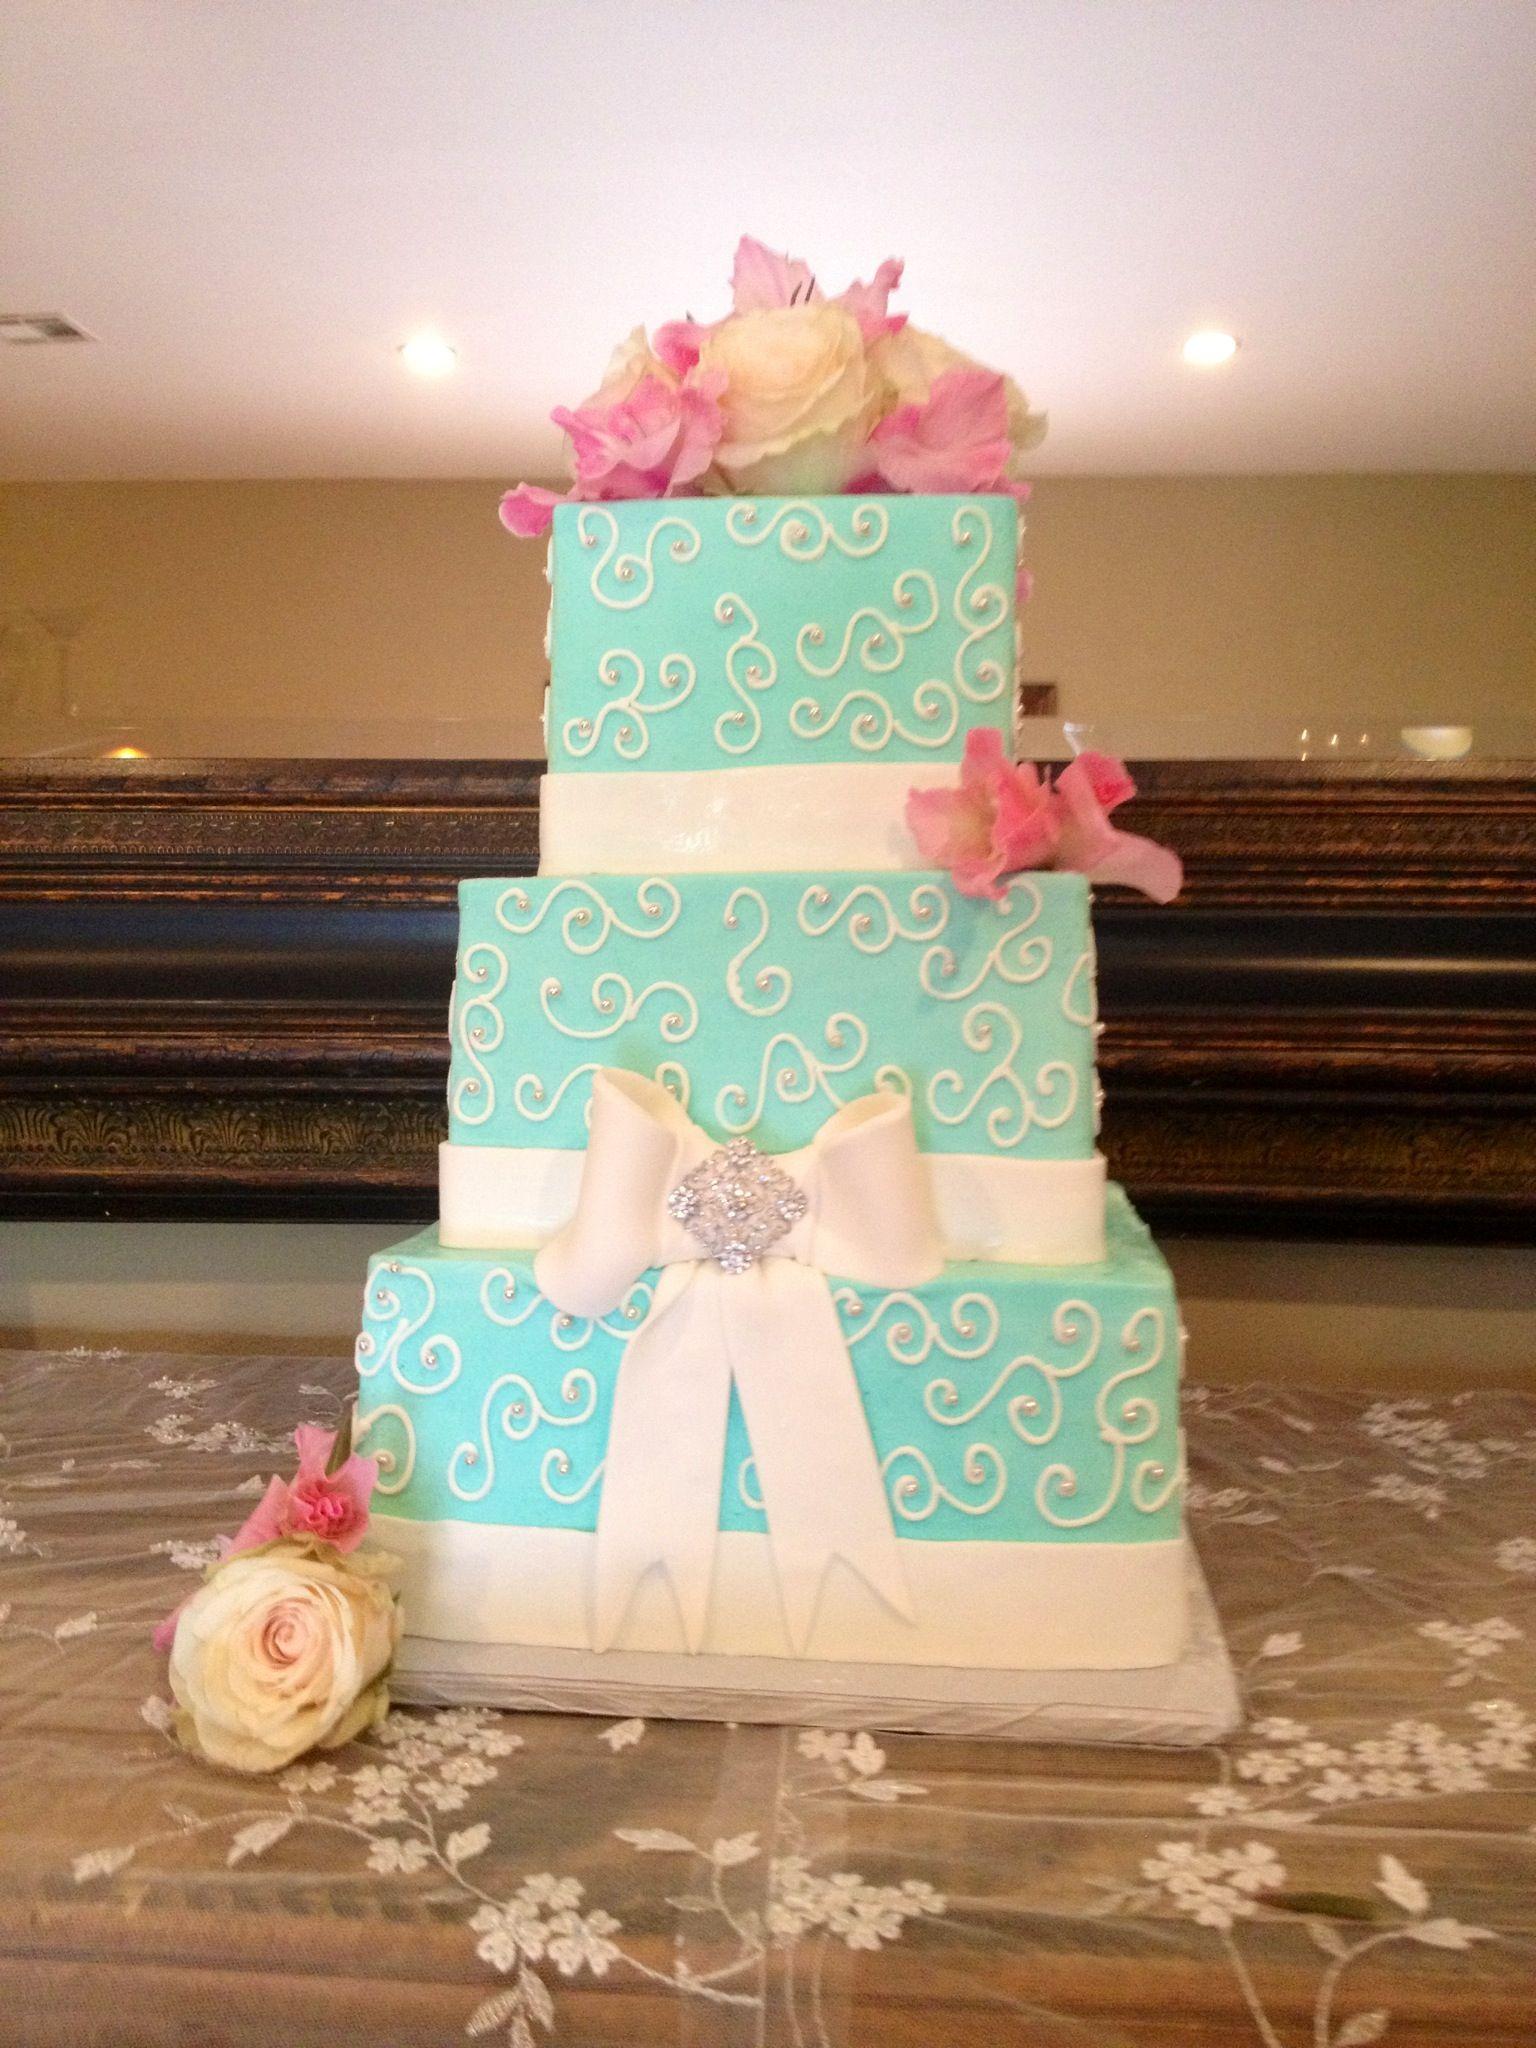 Wedding Cakes Pictures: Blue Damask Wedding Cakes Pictures |Pink And Blue Wedding Cakes